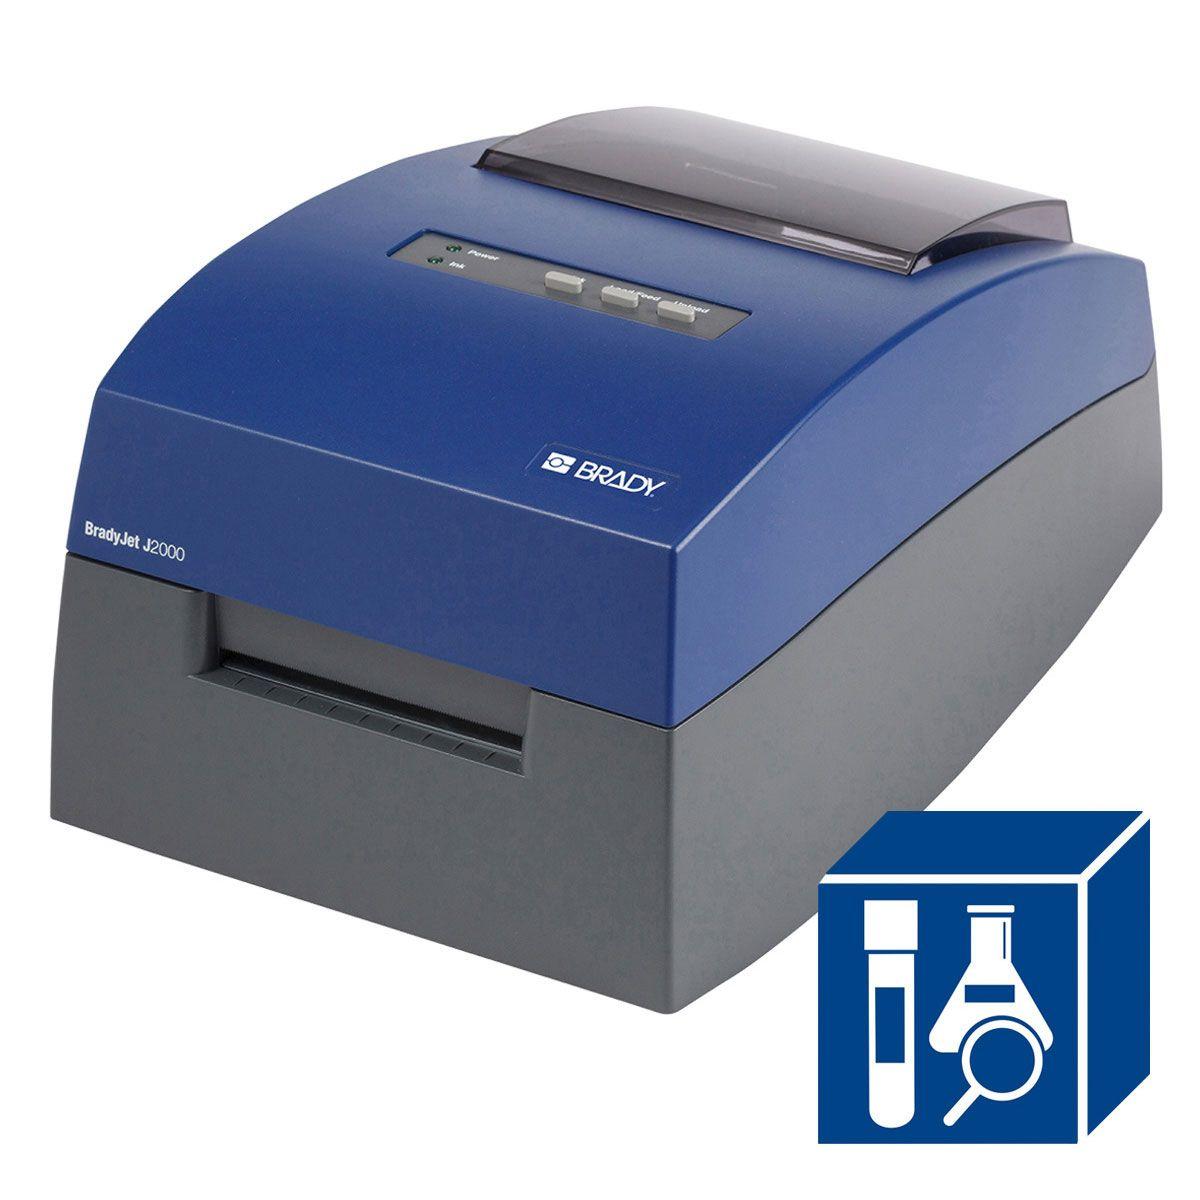 BradyJet J2000 Inkjet Full Color Printer with Lab Software